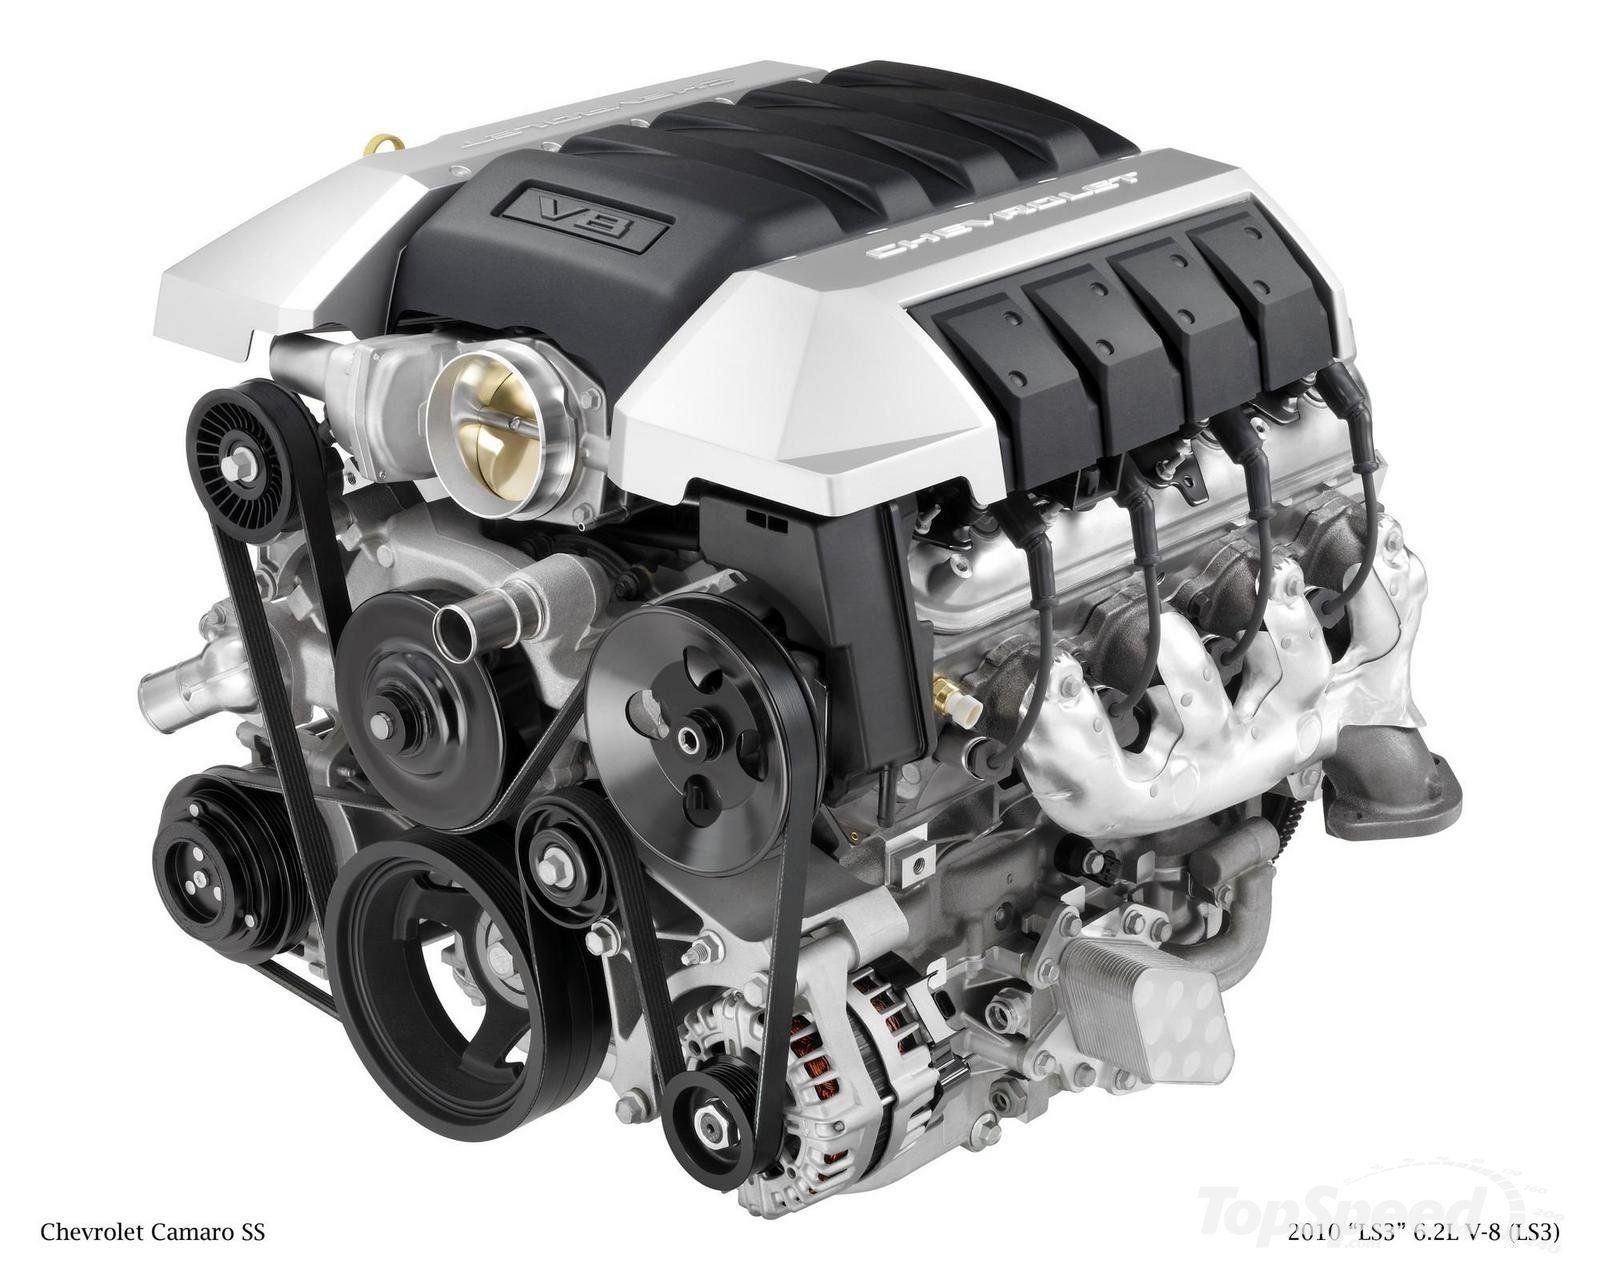 2012 Chevrolet Camaro LS3 6.2L V8 Engine Ls engine